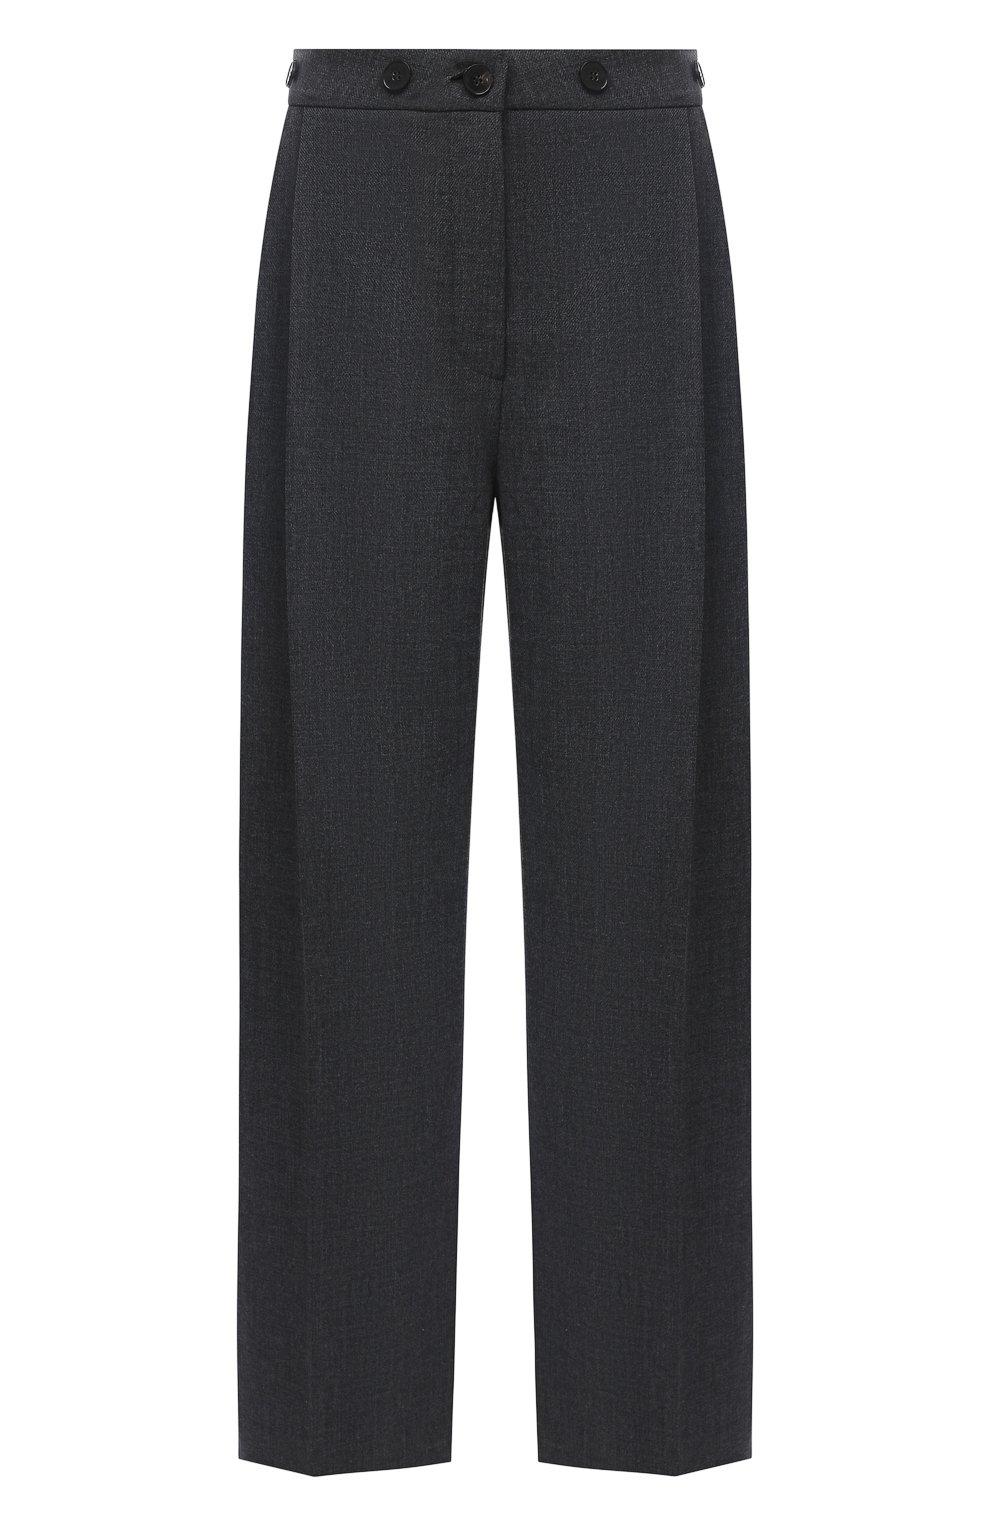 Женские брюки RUBAN серого цвета, арт. RPW20/21-7.1.45.4 | Фото 1